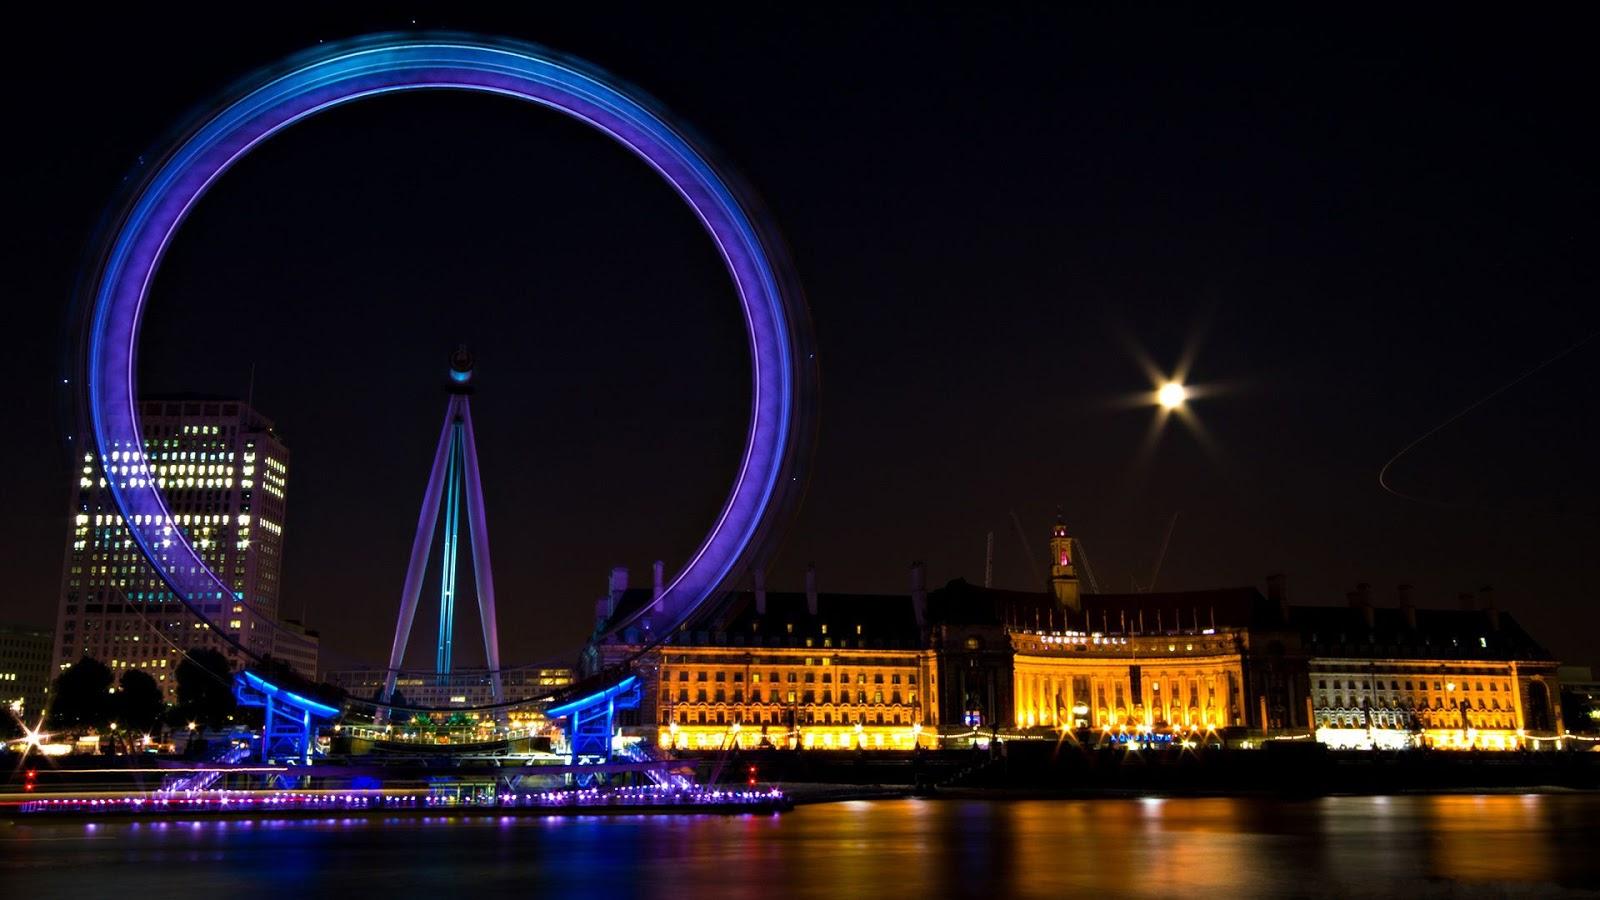 london high resolution - photo #21